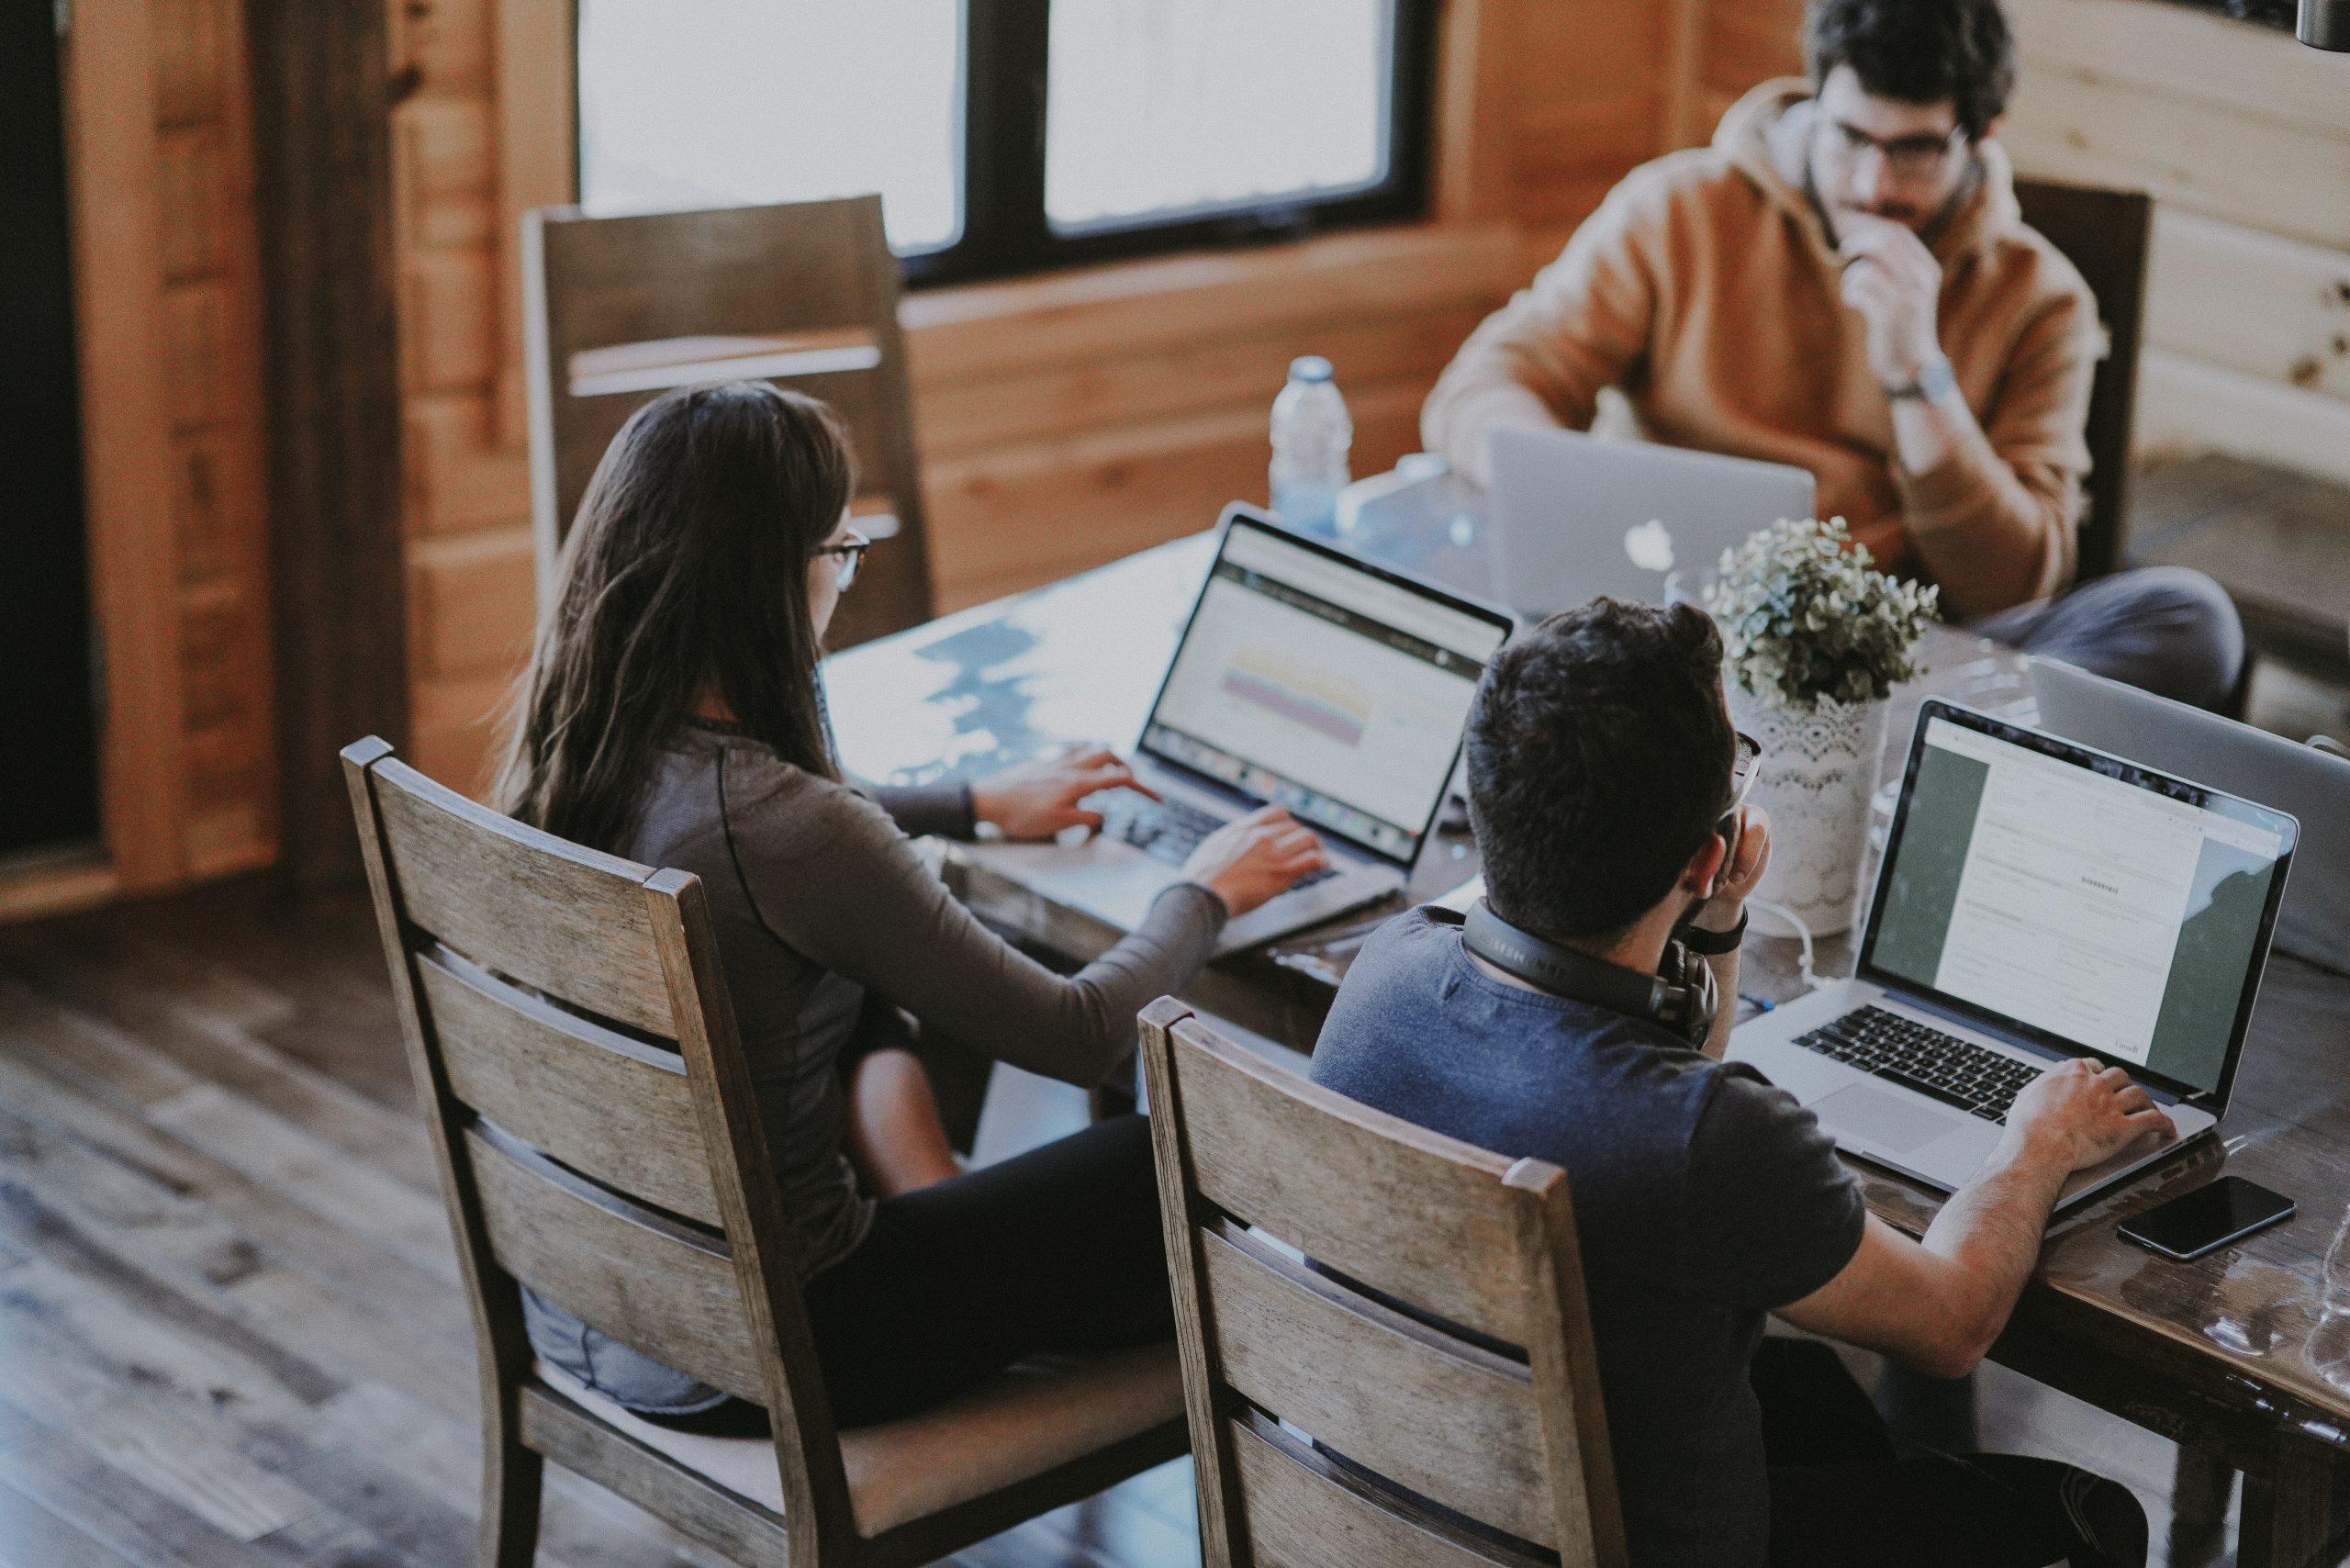 marketing-agencia-comunicación-palma-mallorca-redes-sociales-community-manager-asesoria-consultoria-arantxa-vico-the-808-agency-conoce-como-piensan-los-millennials2